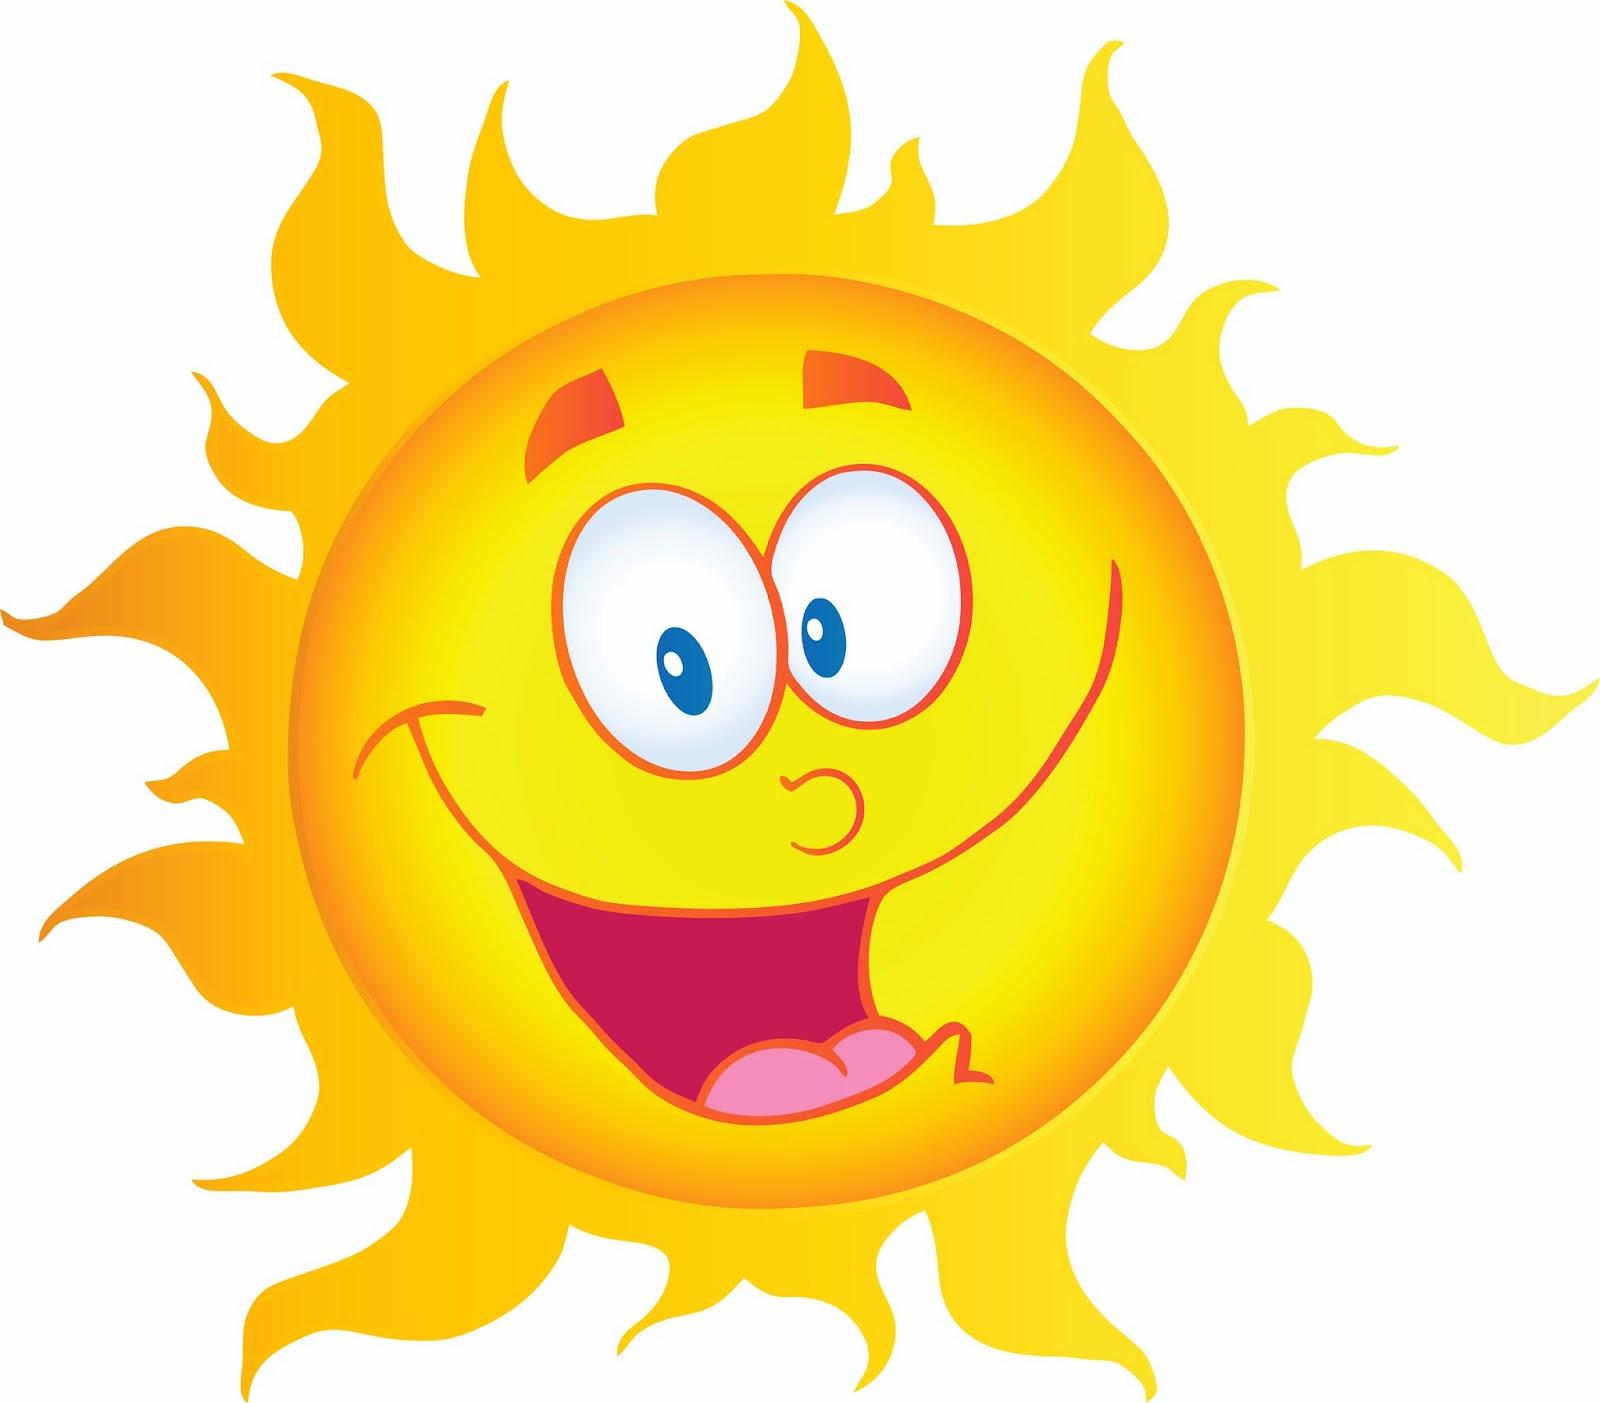 Sad sun clip art free clipart image